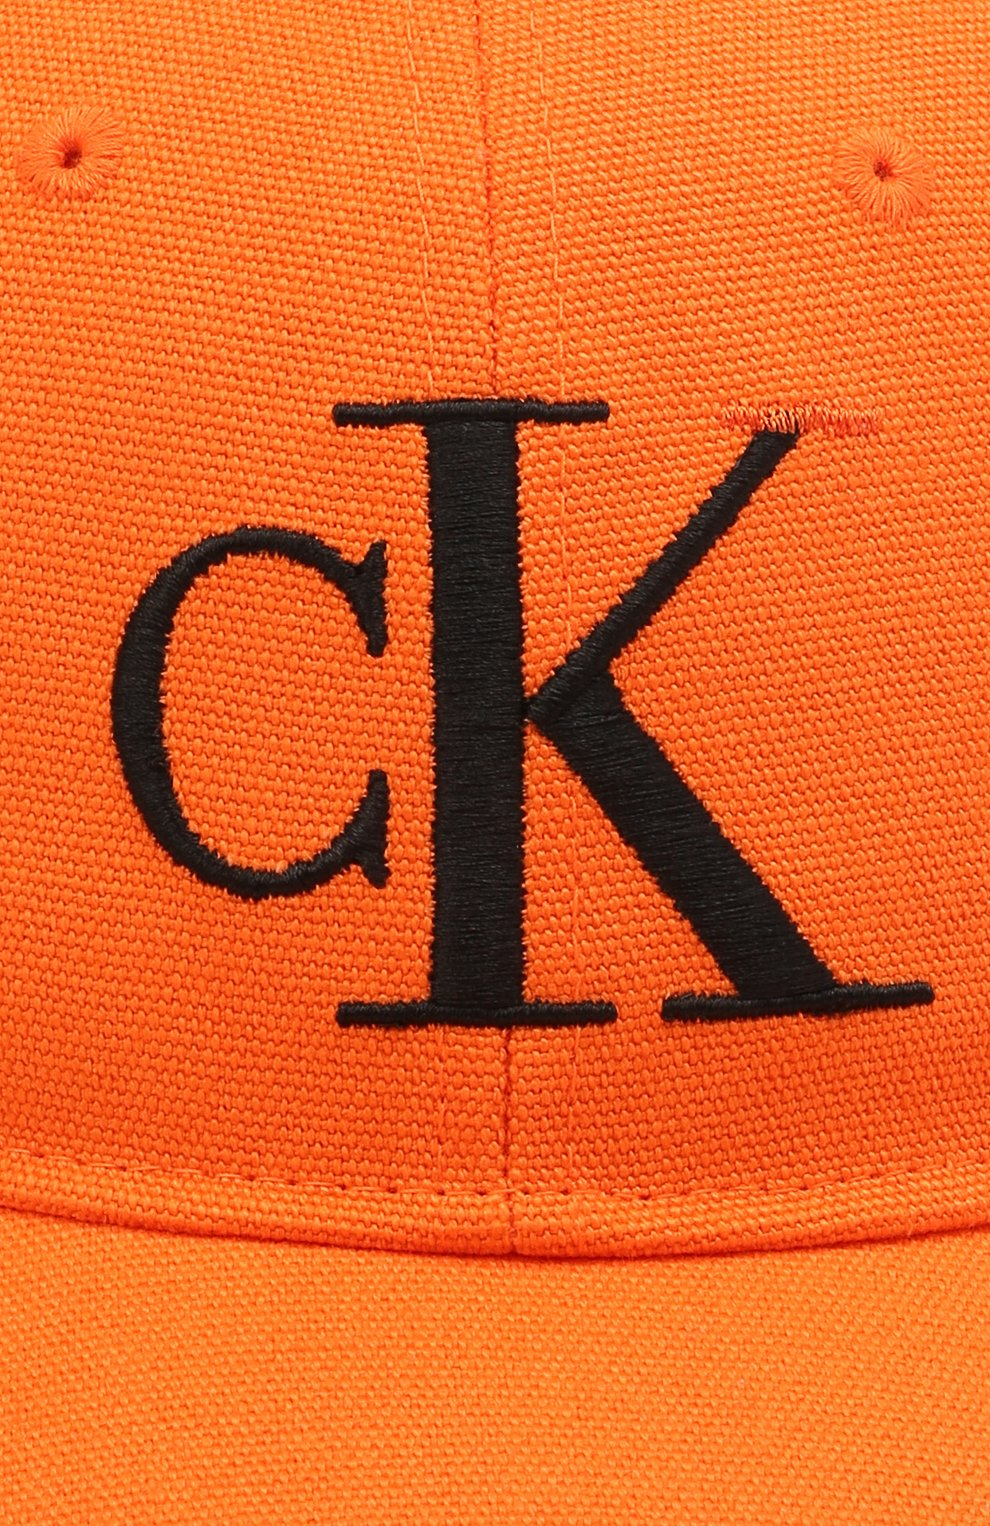 Женская хлопковая бейсболка HERON PRESTON FOR CALVIN KLEIN оранжевого цвета, арт. K50K508122   Фото 3